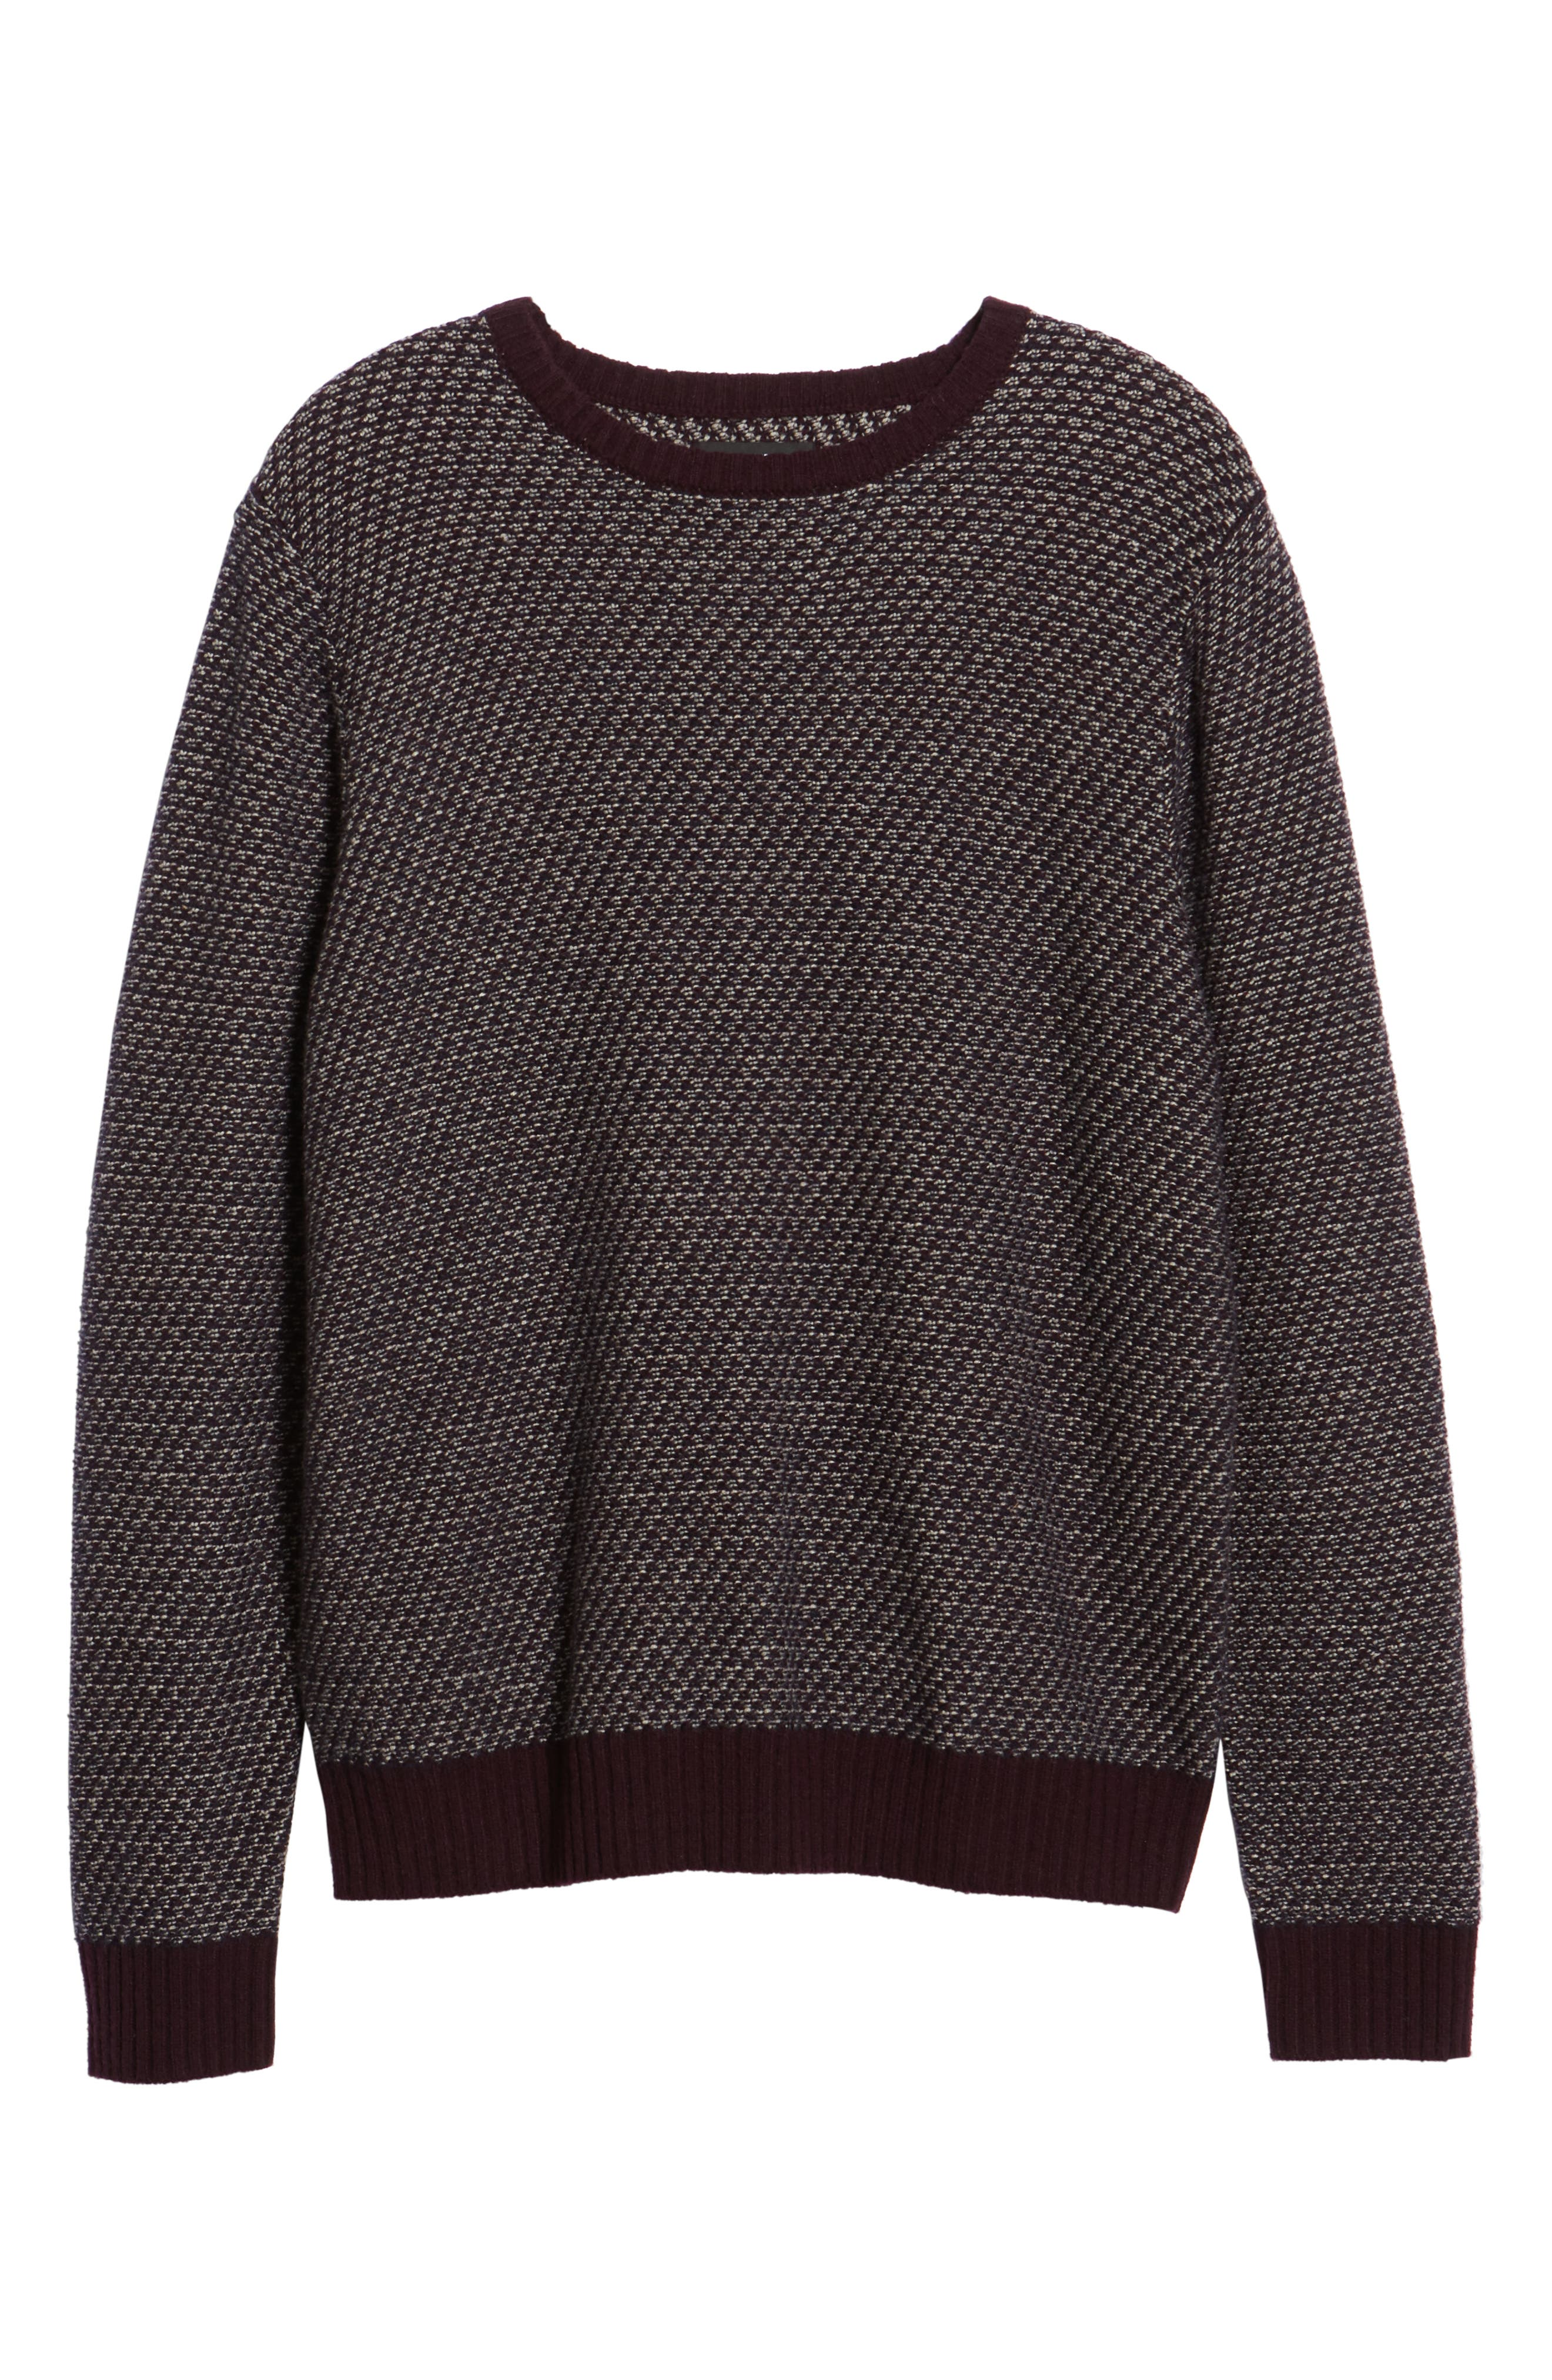 Jacquard Wool & Cashmere Sweater,                             Alternate thumbnail 6, color,                             938